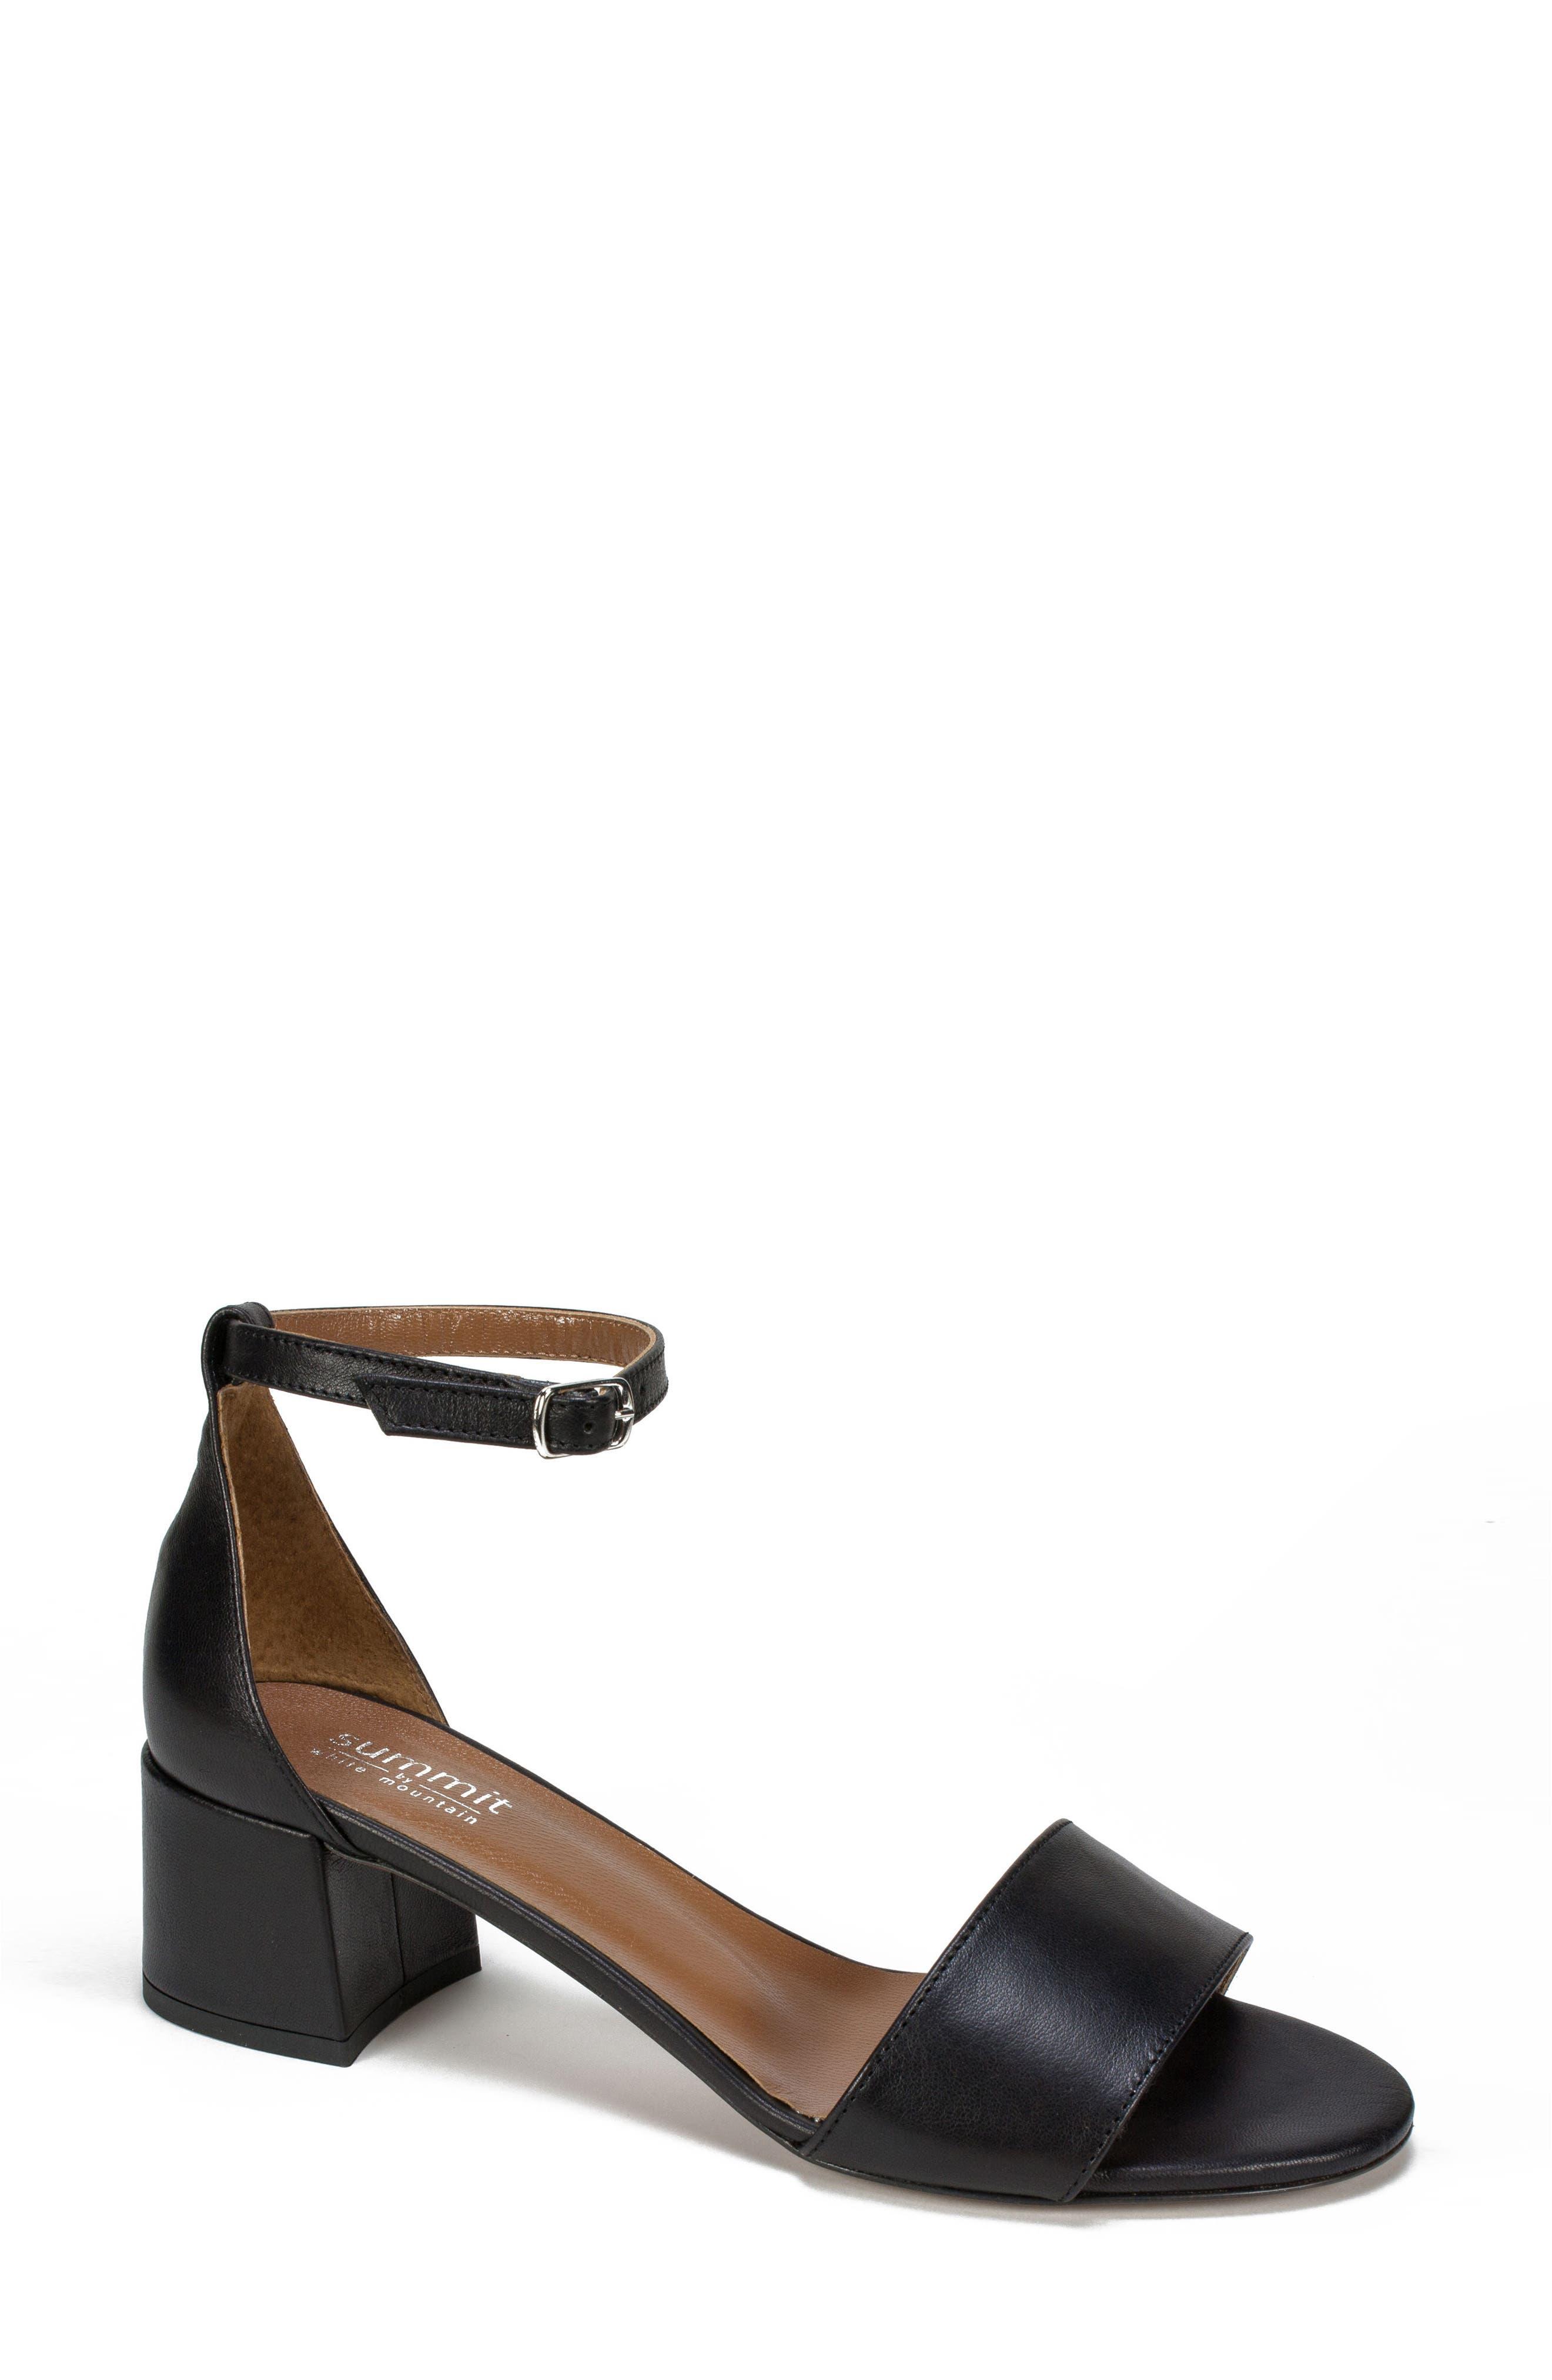 Ameila Block Heel Sandal,                             Main thumbnail 1, color,                             Black Leather